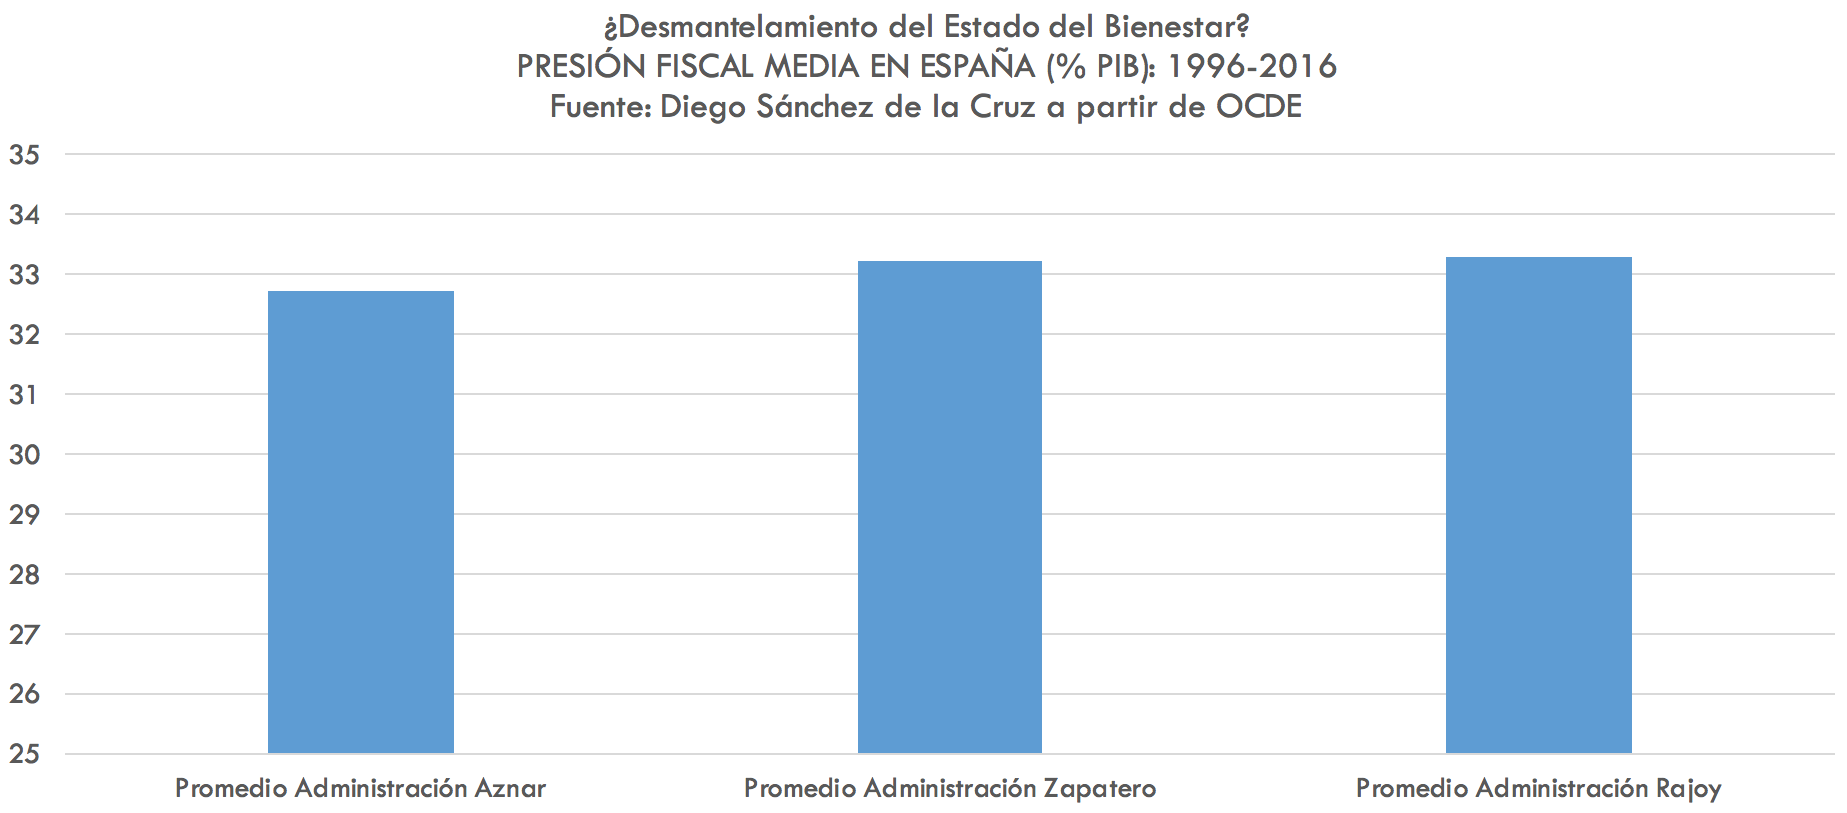 4-Presion-fiscal-Espana-OCDE.png